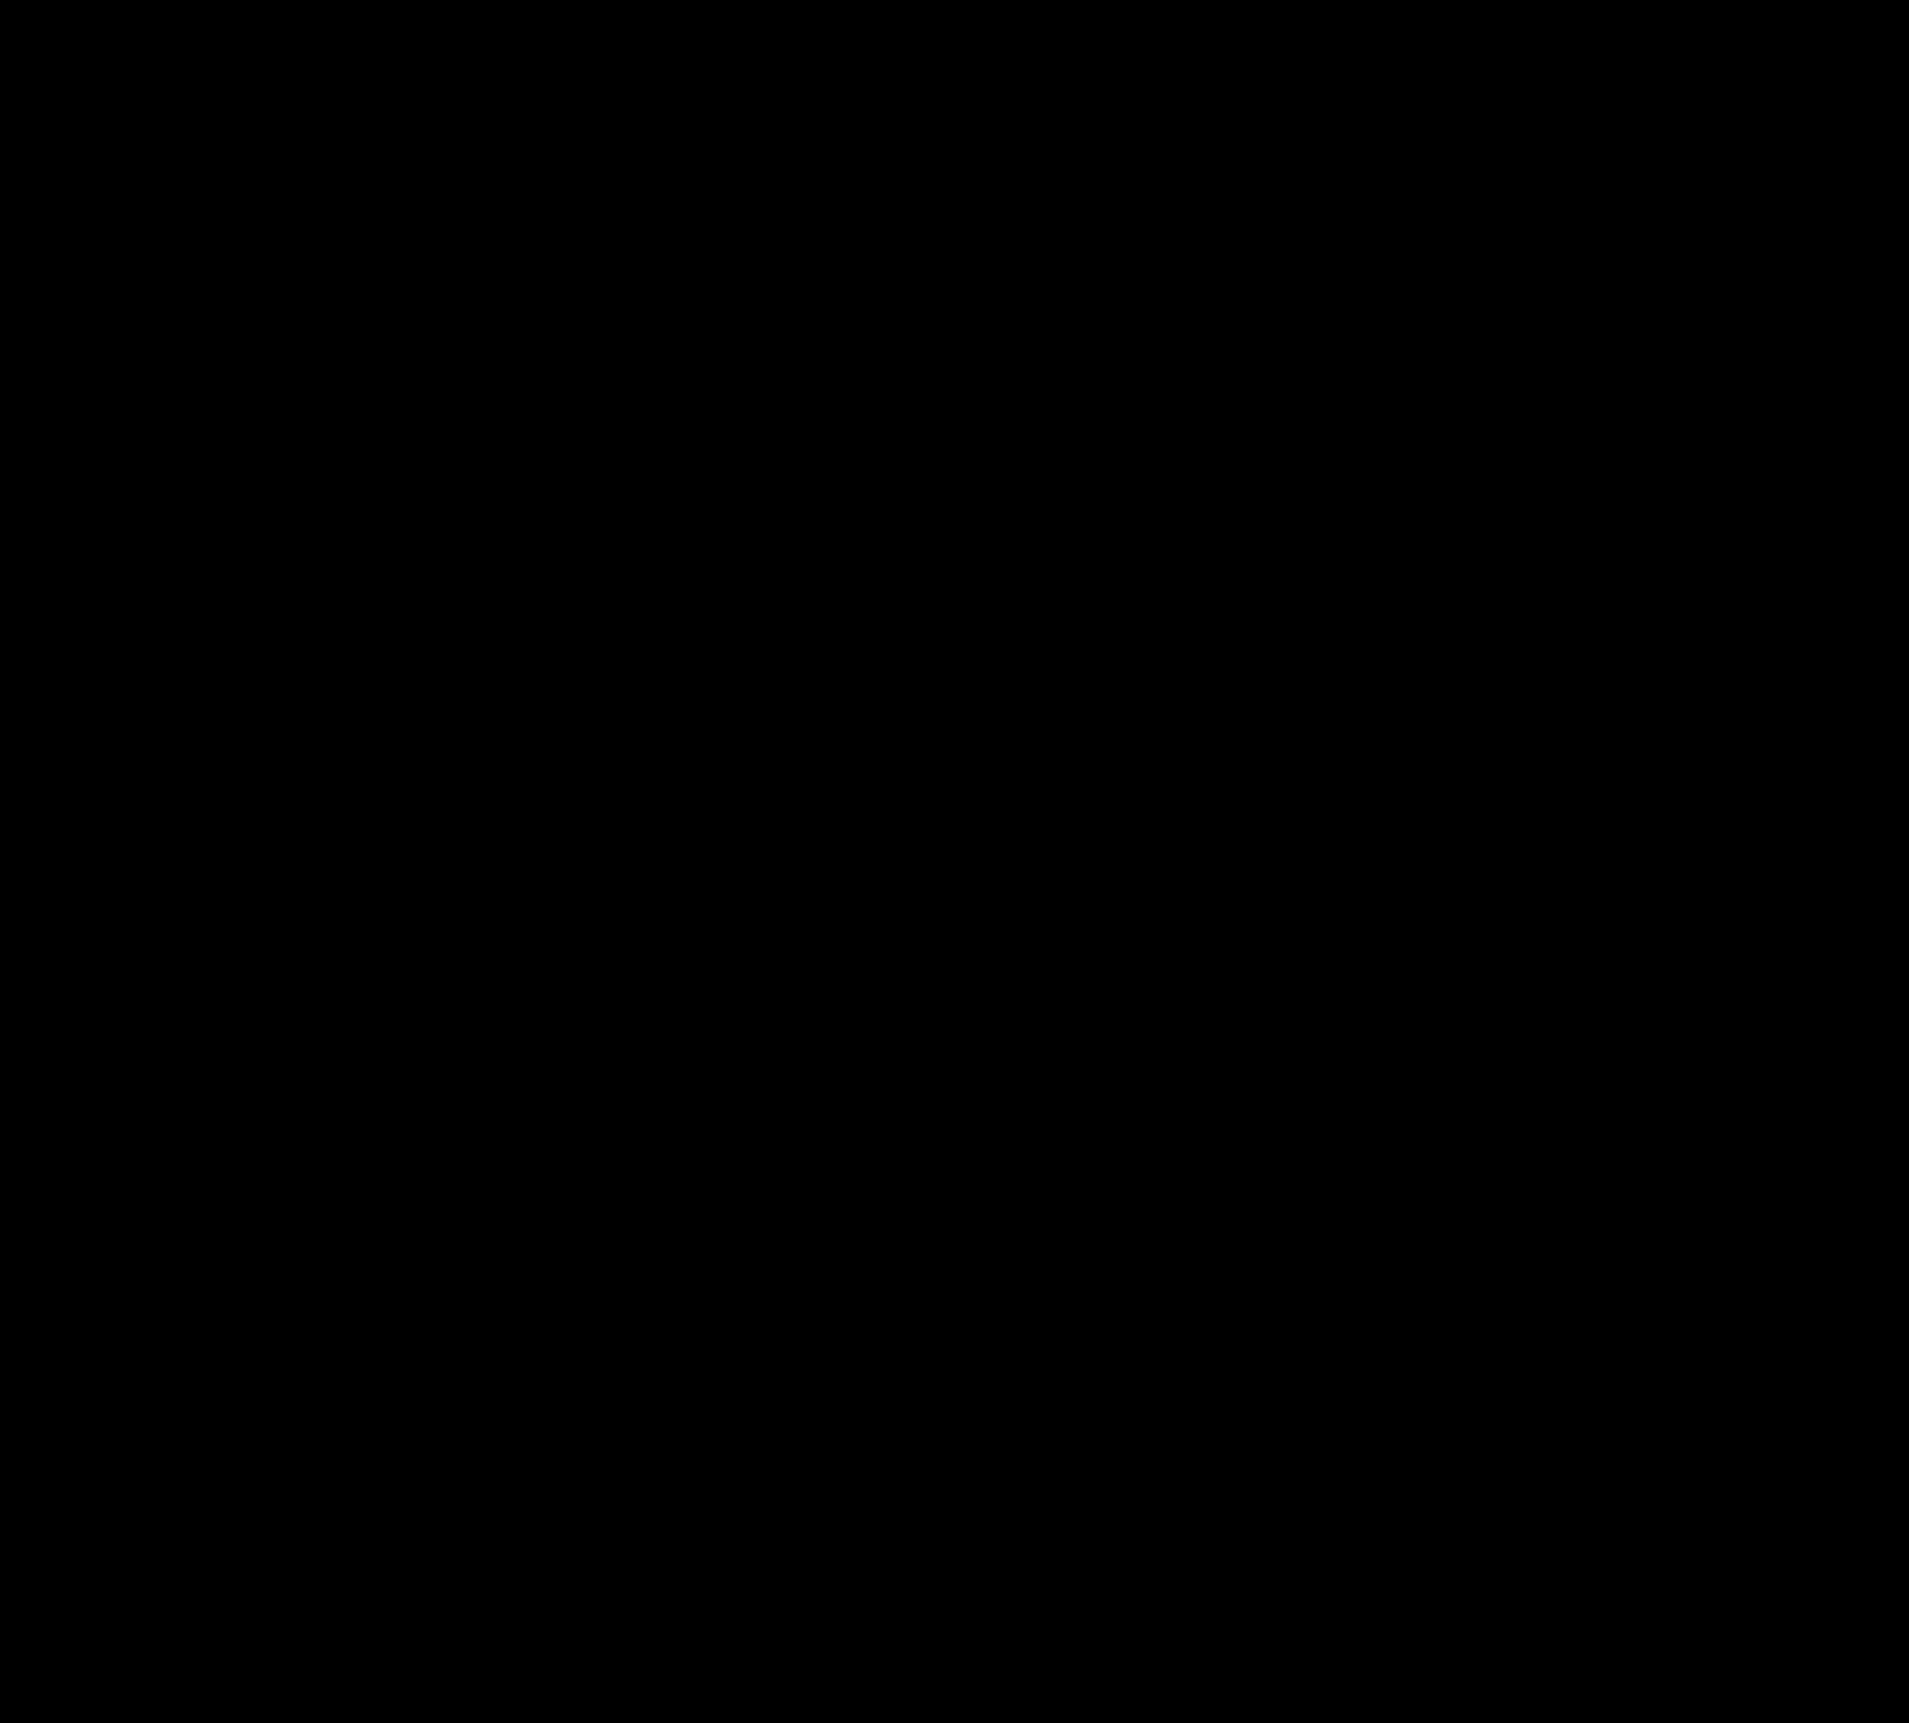 Colored Venn Diagram